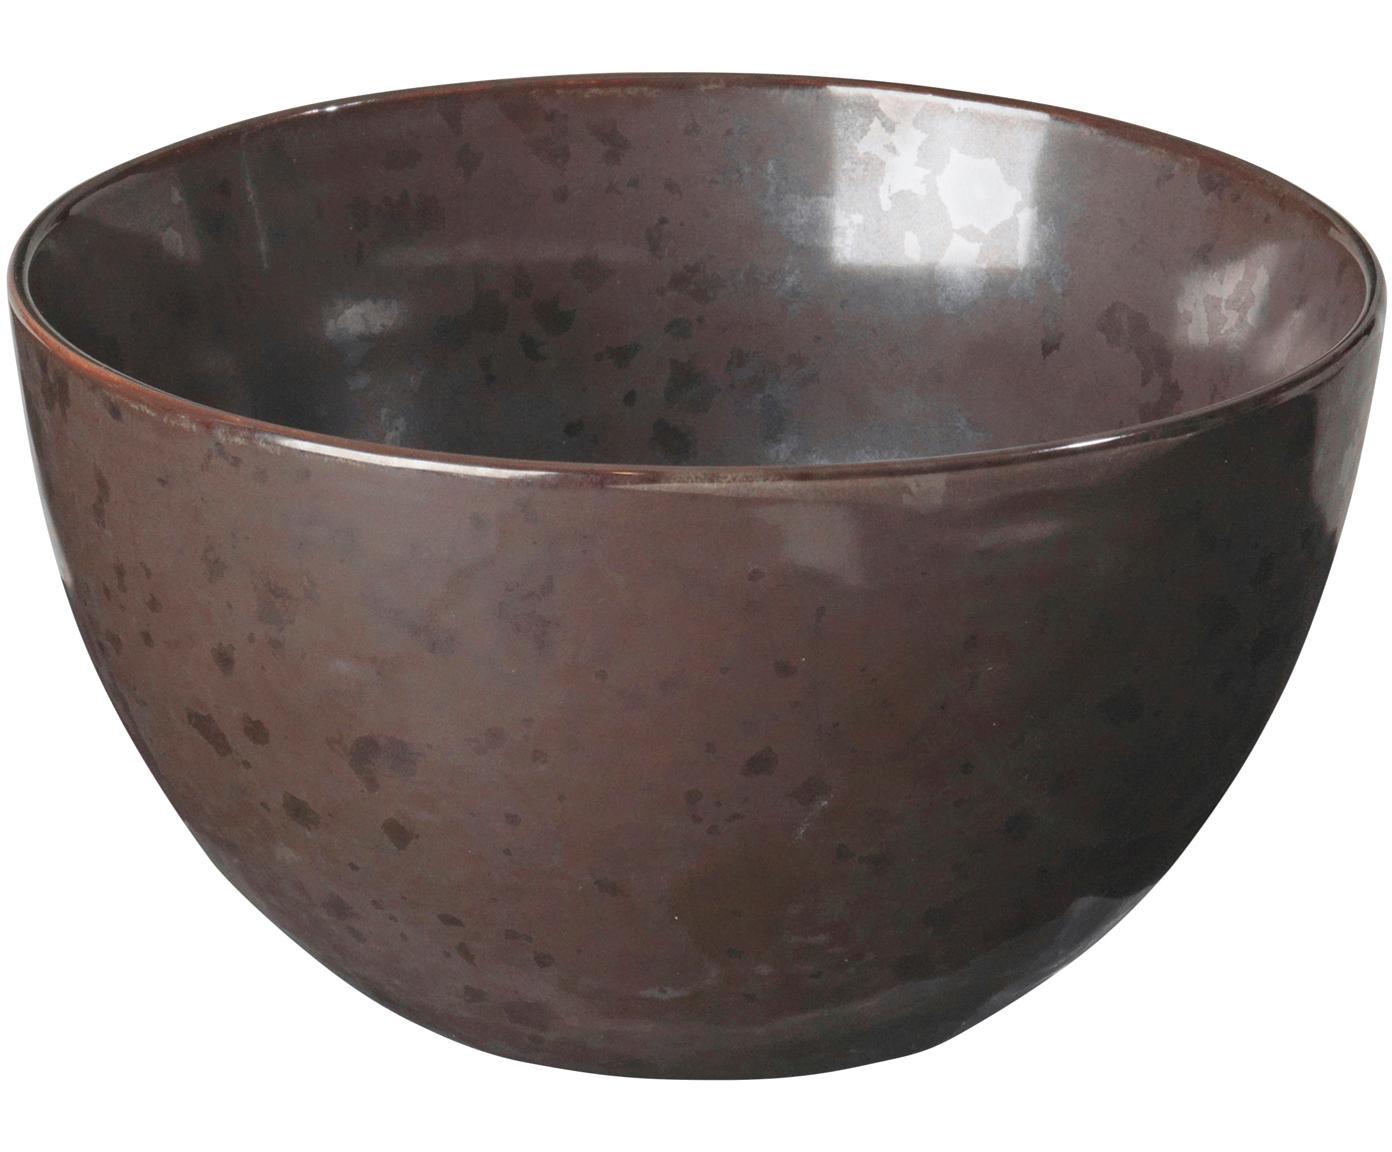 Ciotole artigianali Esrum Night, 4 pz., Gres smaltata, Marrone grigiastro lucido argenteo opaco, Ø 14 x A 8 cm